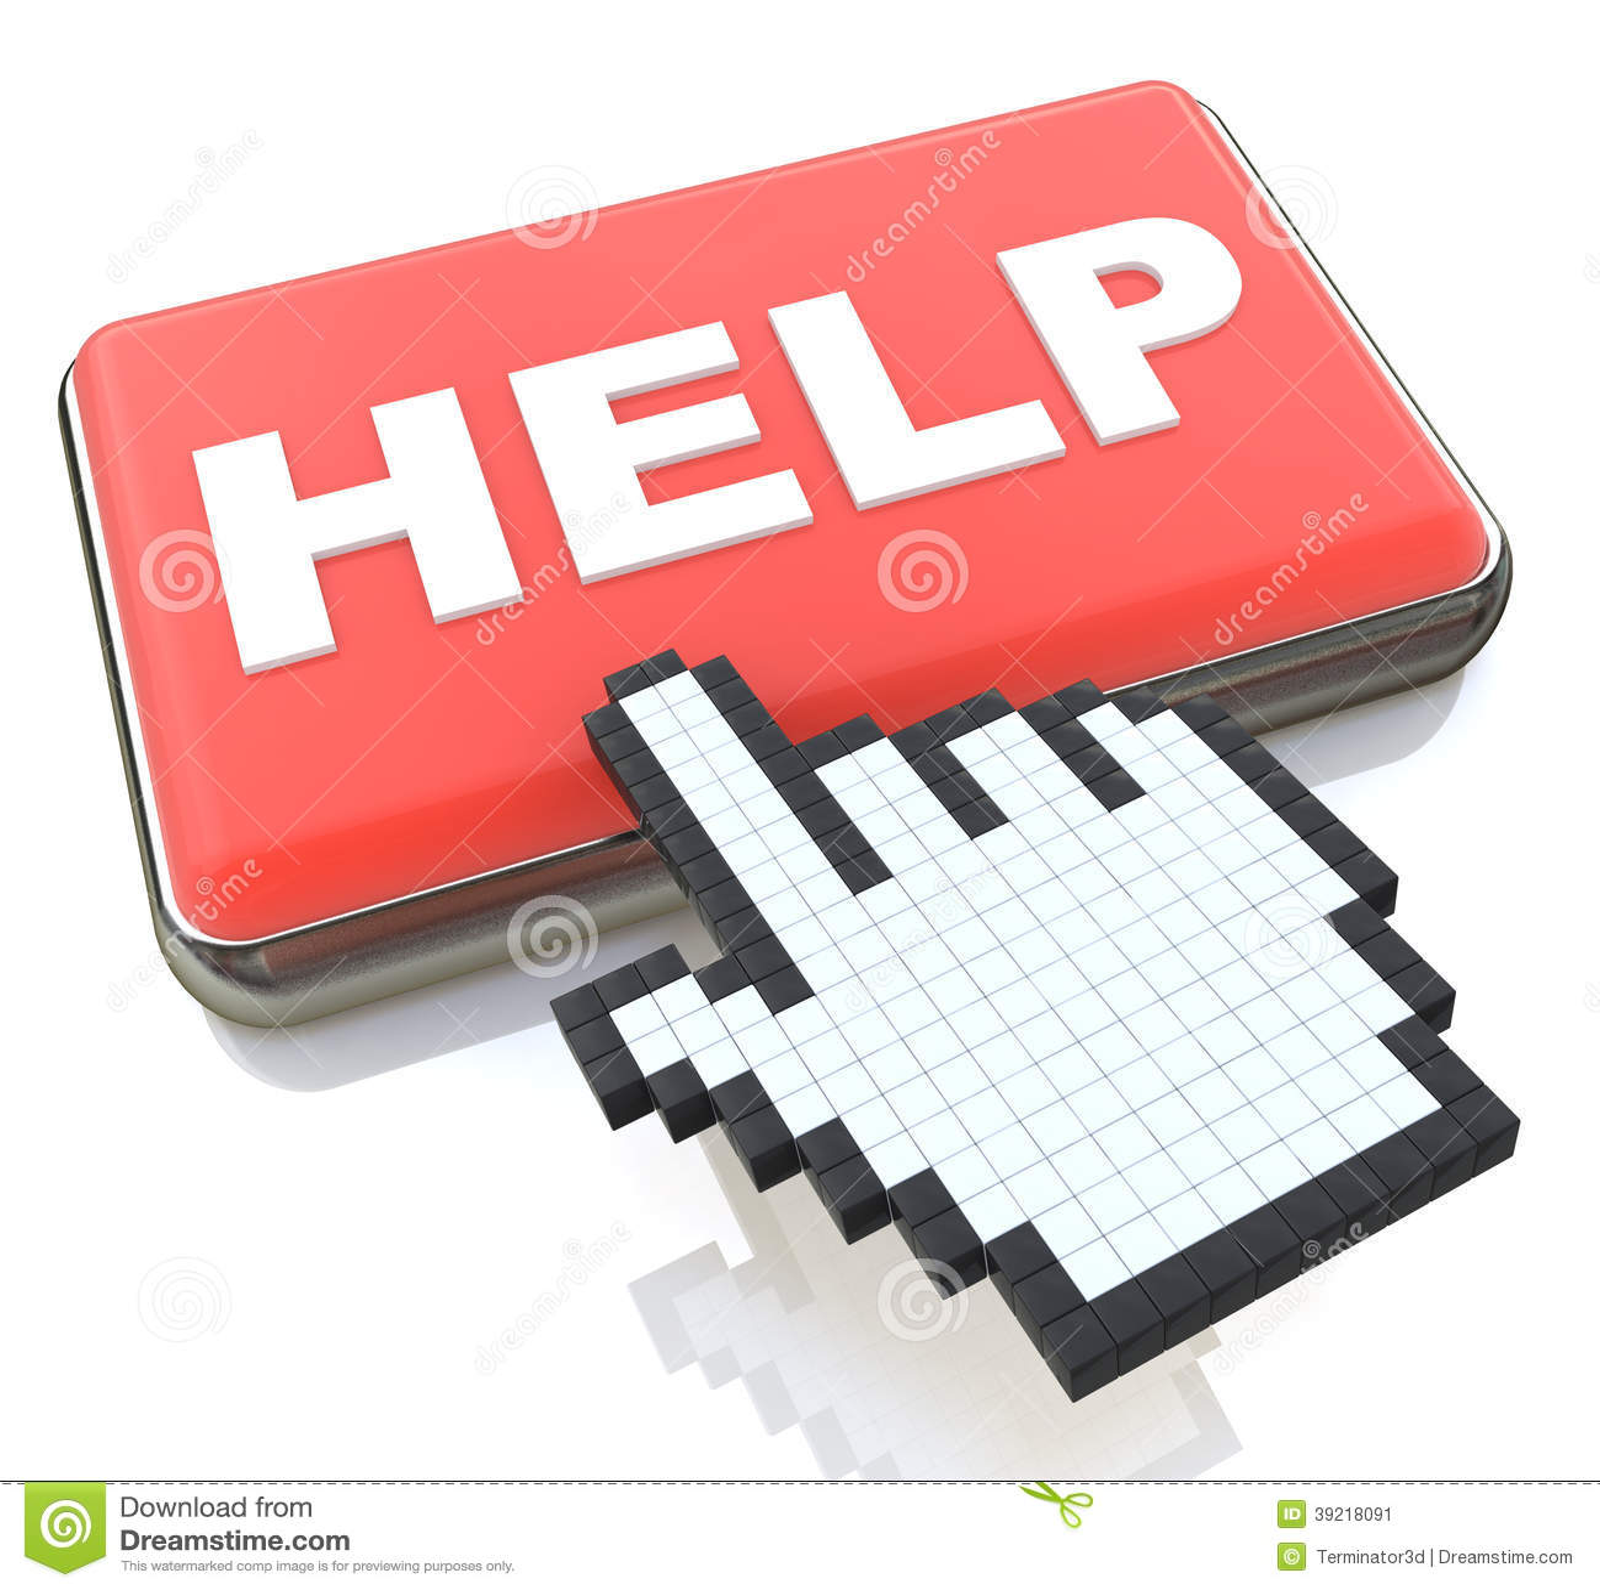 online help stock illustration image 39218091